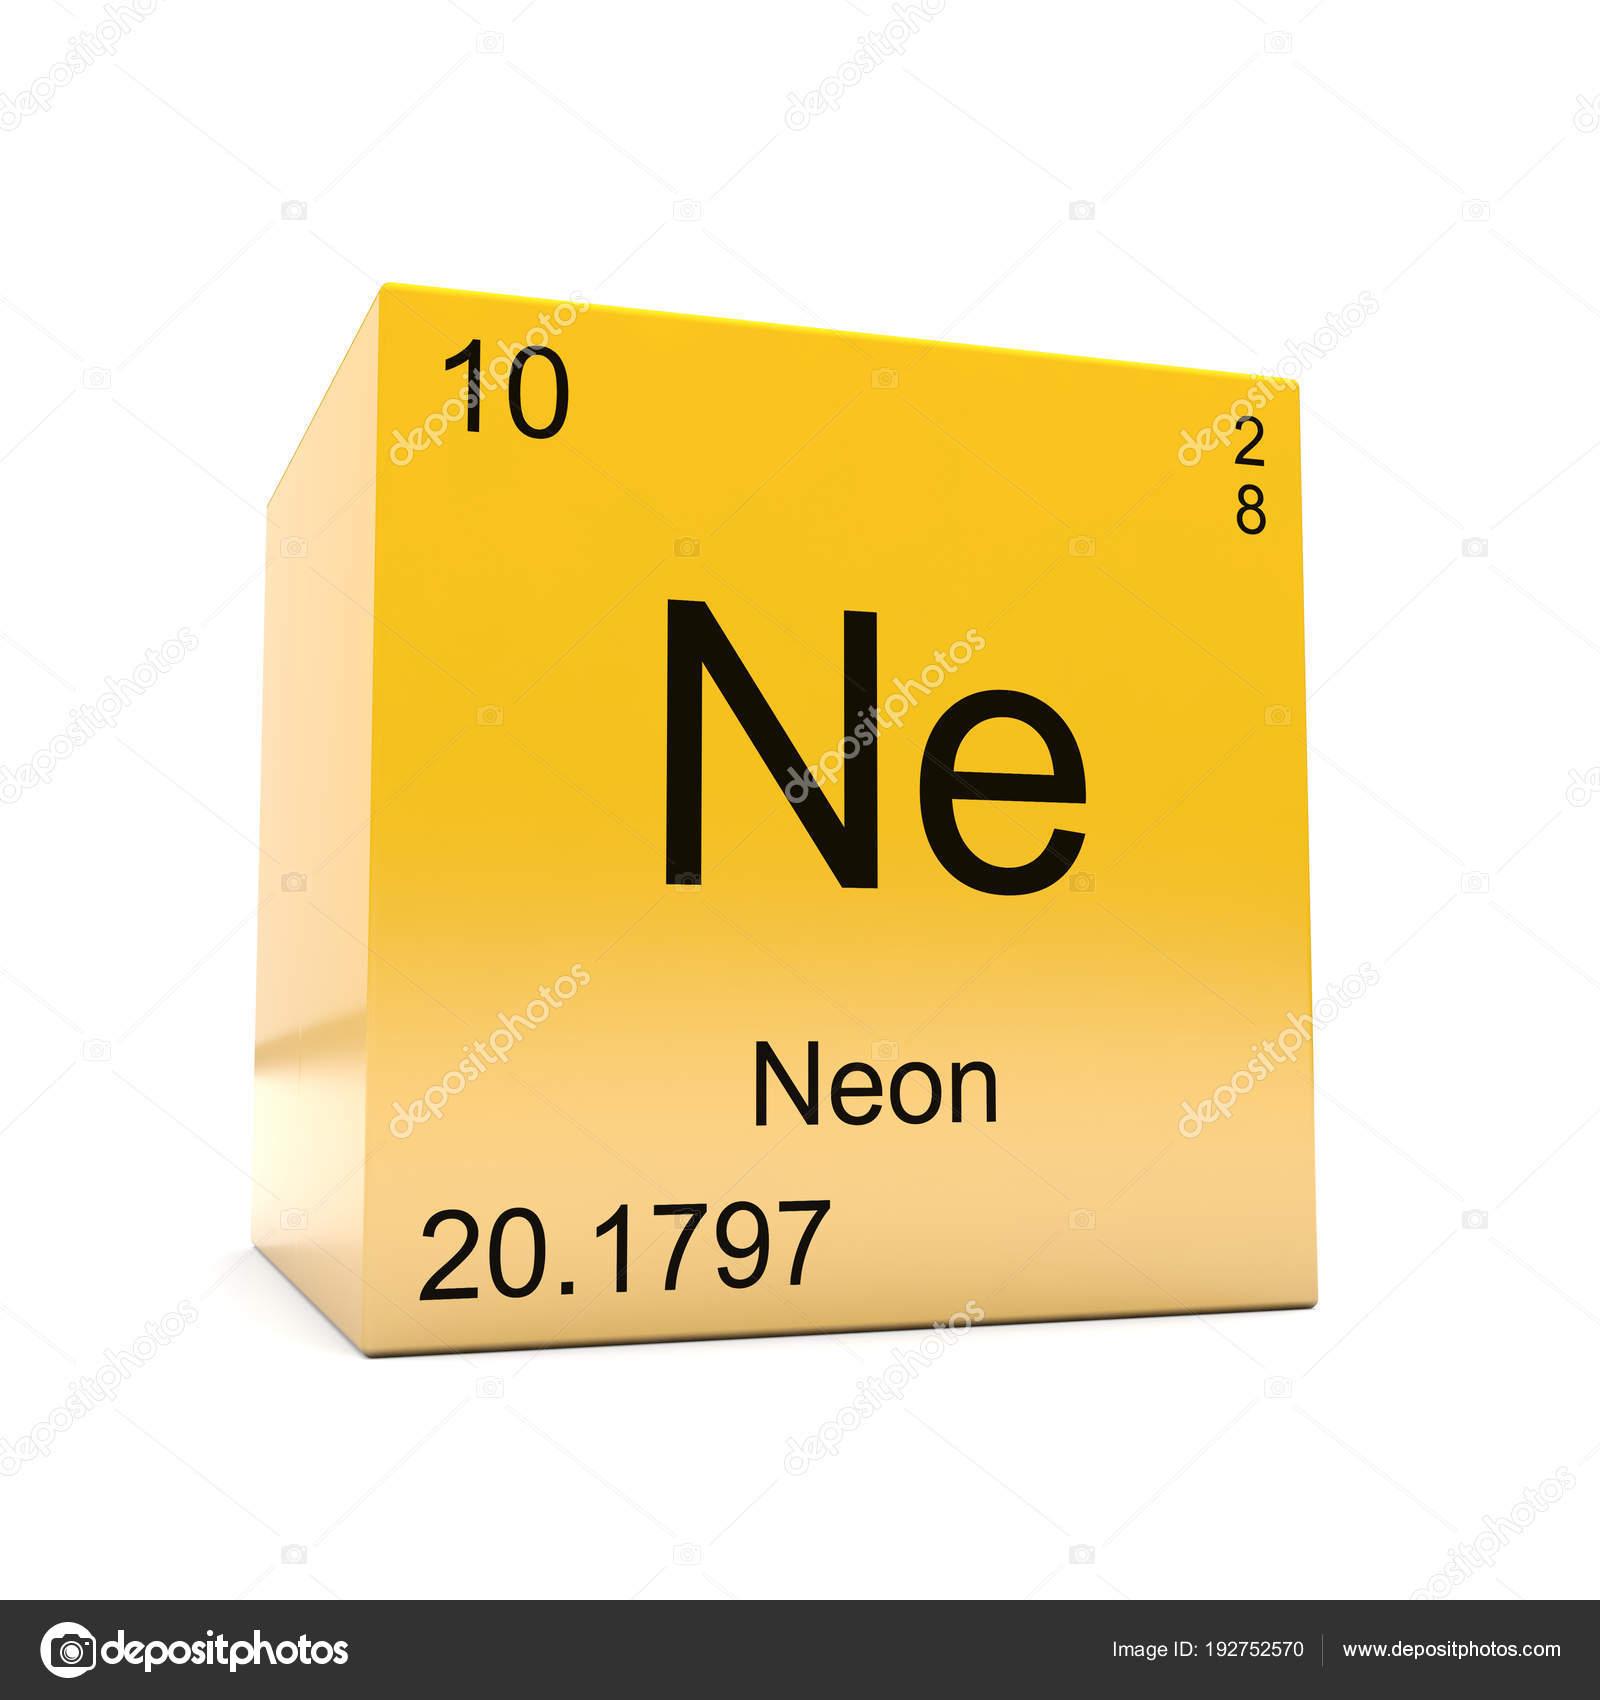 Neon chemical element symbol periodic table displayed glossy yellow neon chemical element symbol periodic table displayed glossy yellow cube stock photo urtaz Gallery